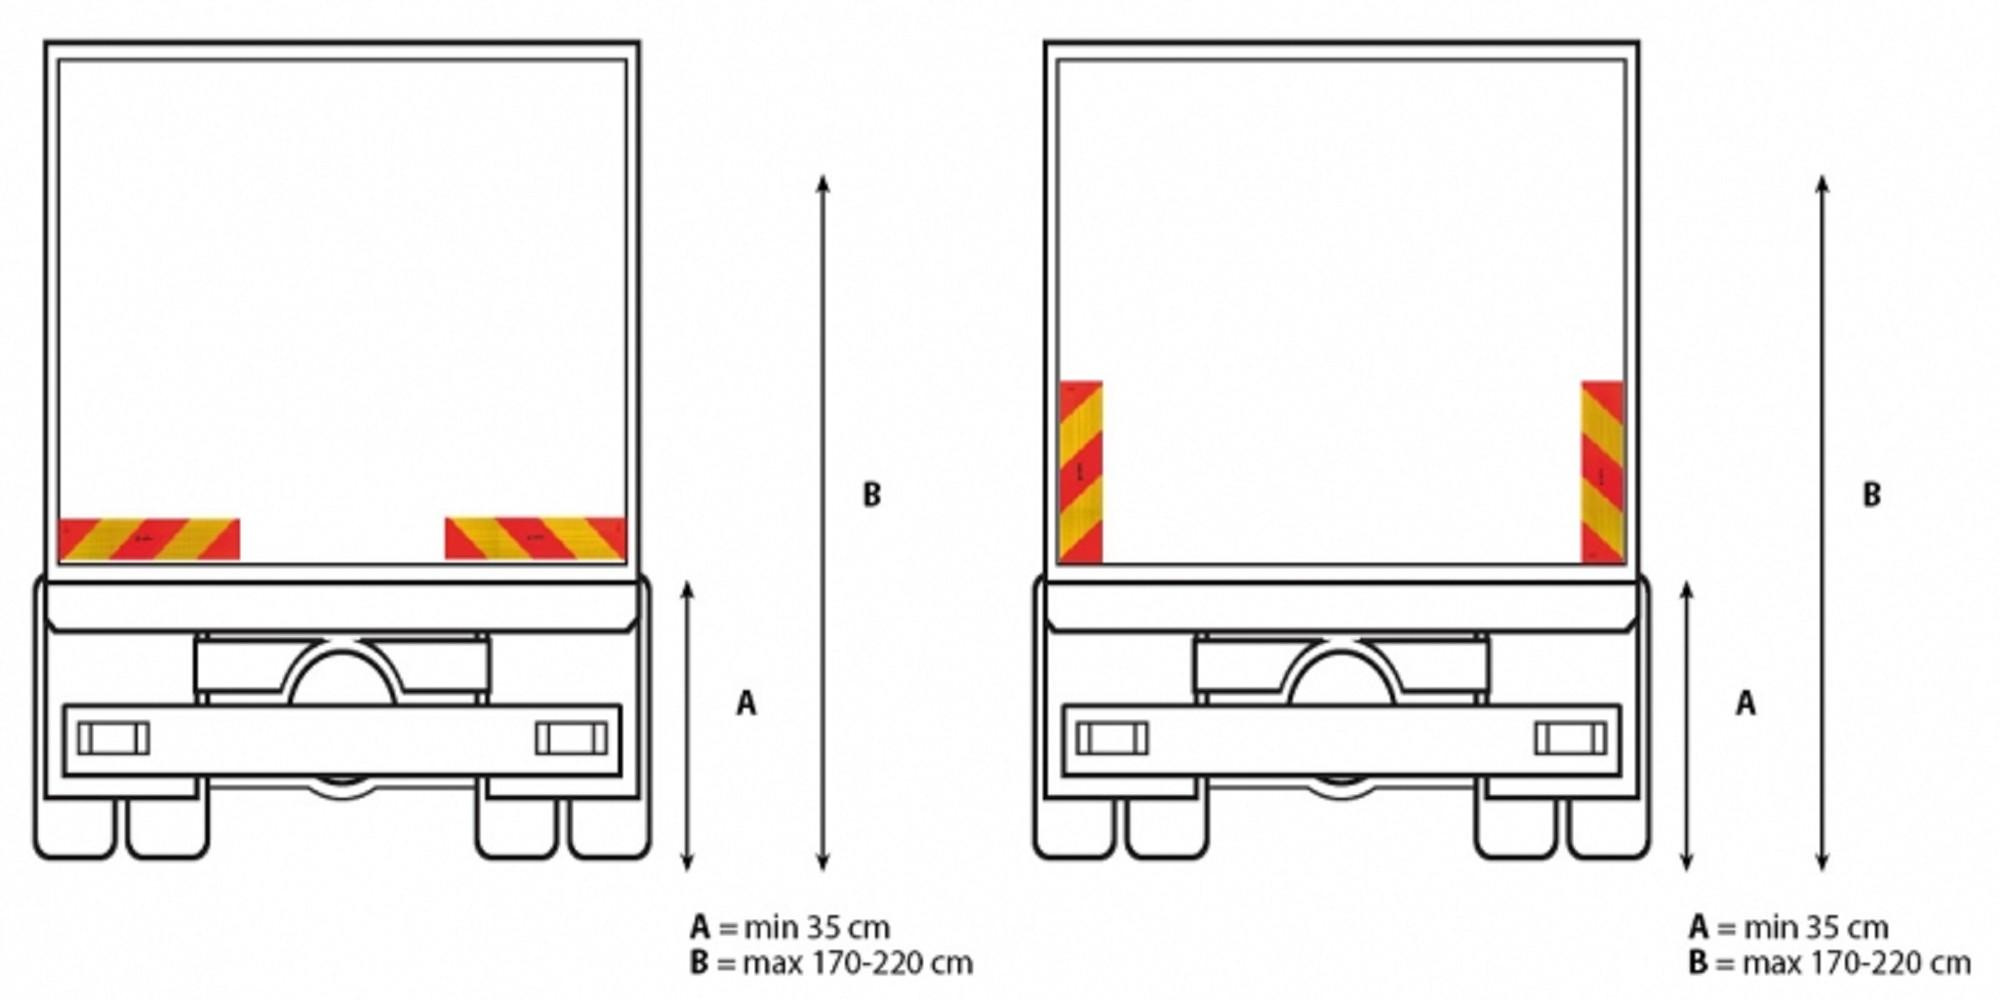 heckwarntafel-montage-horizontal-und-vertikal